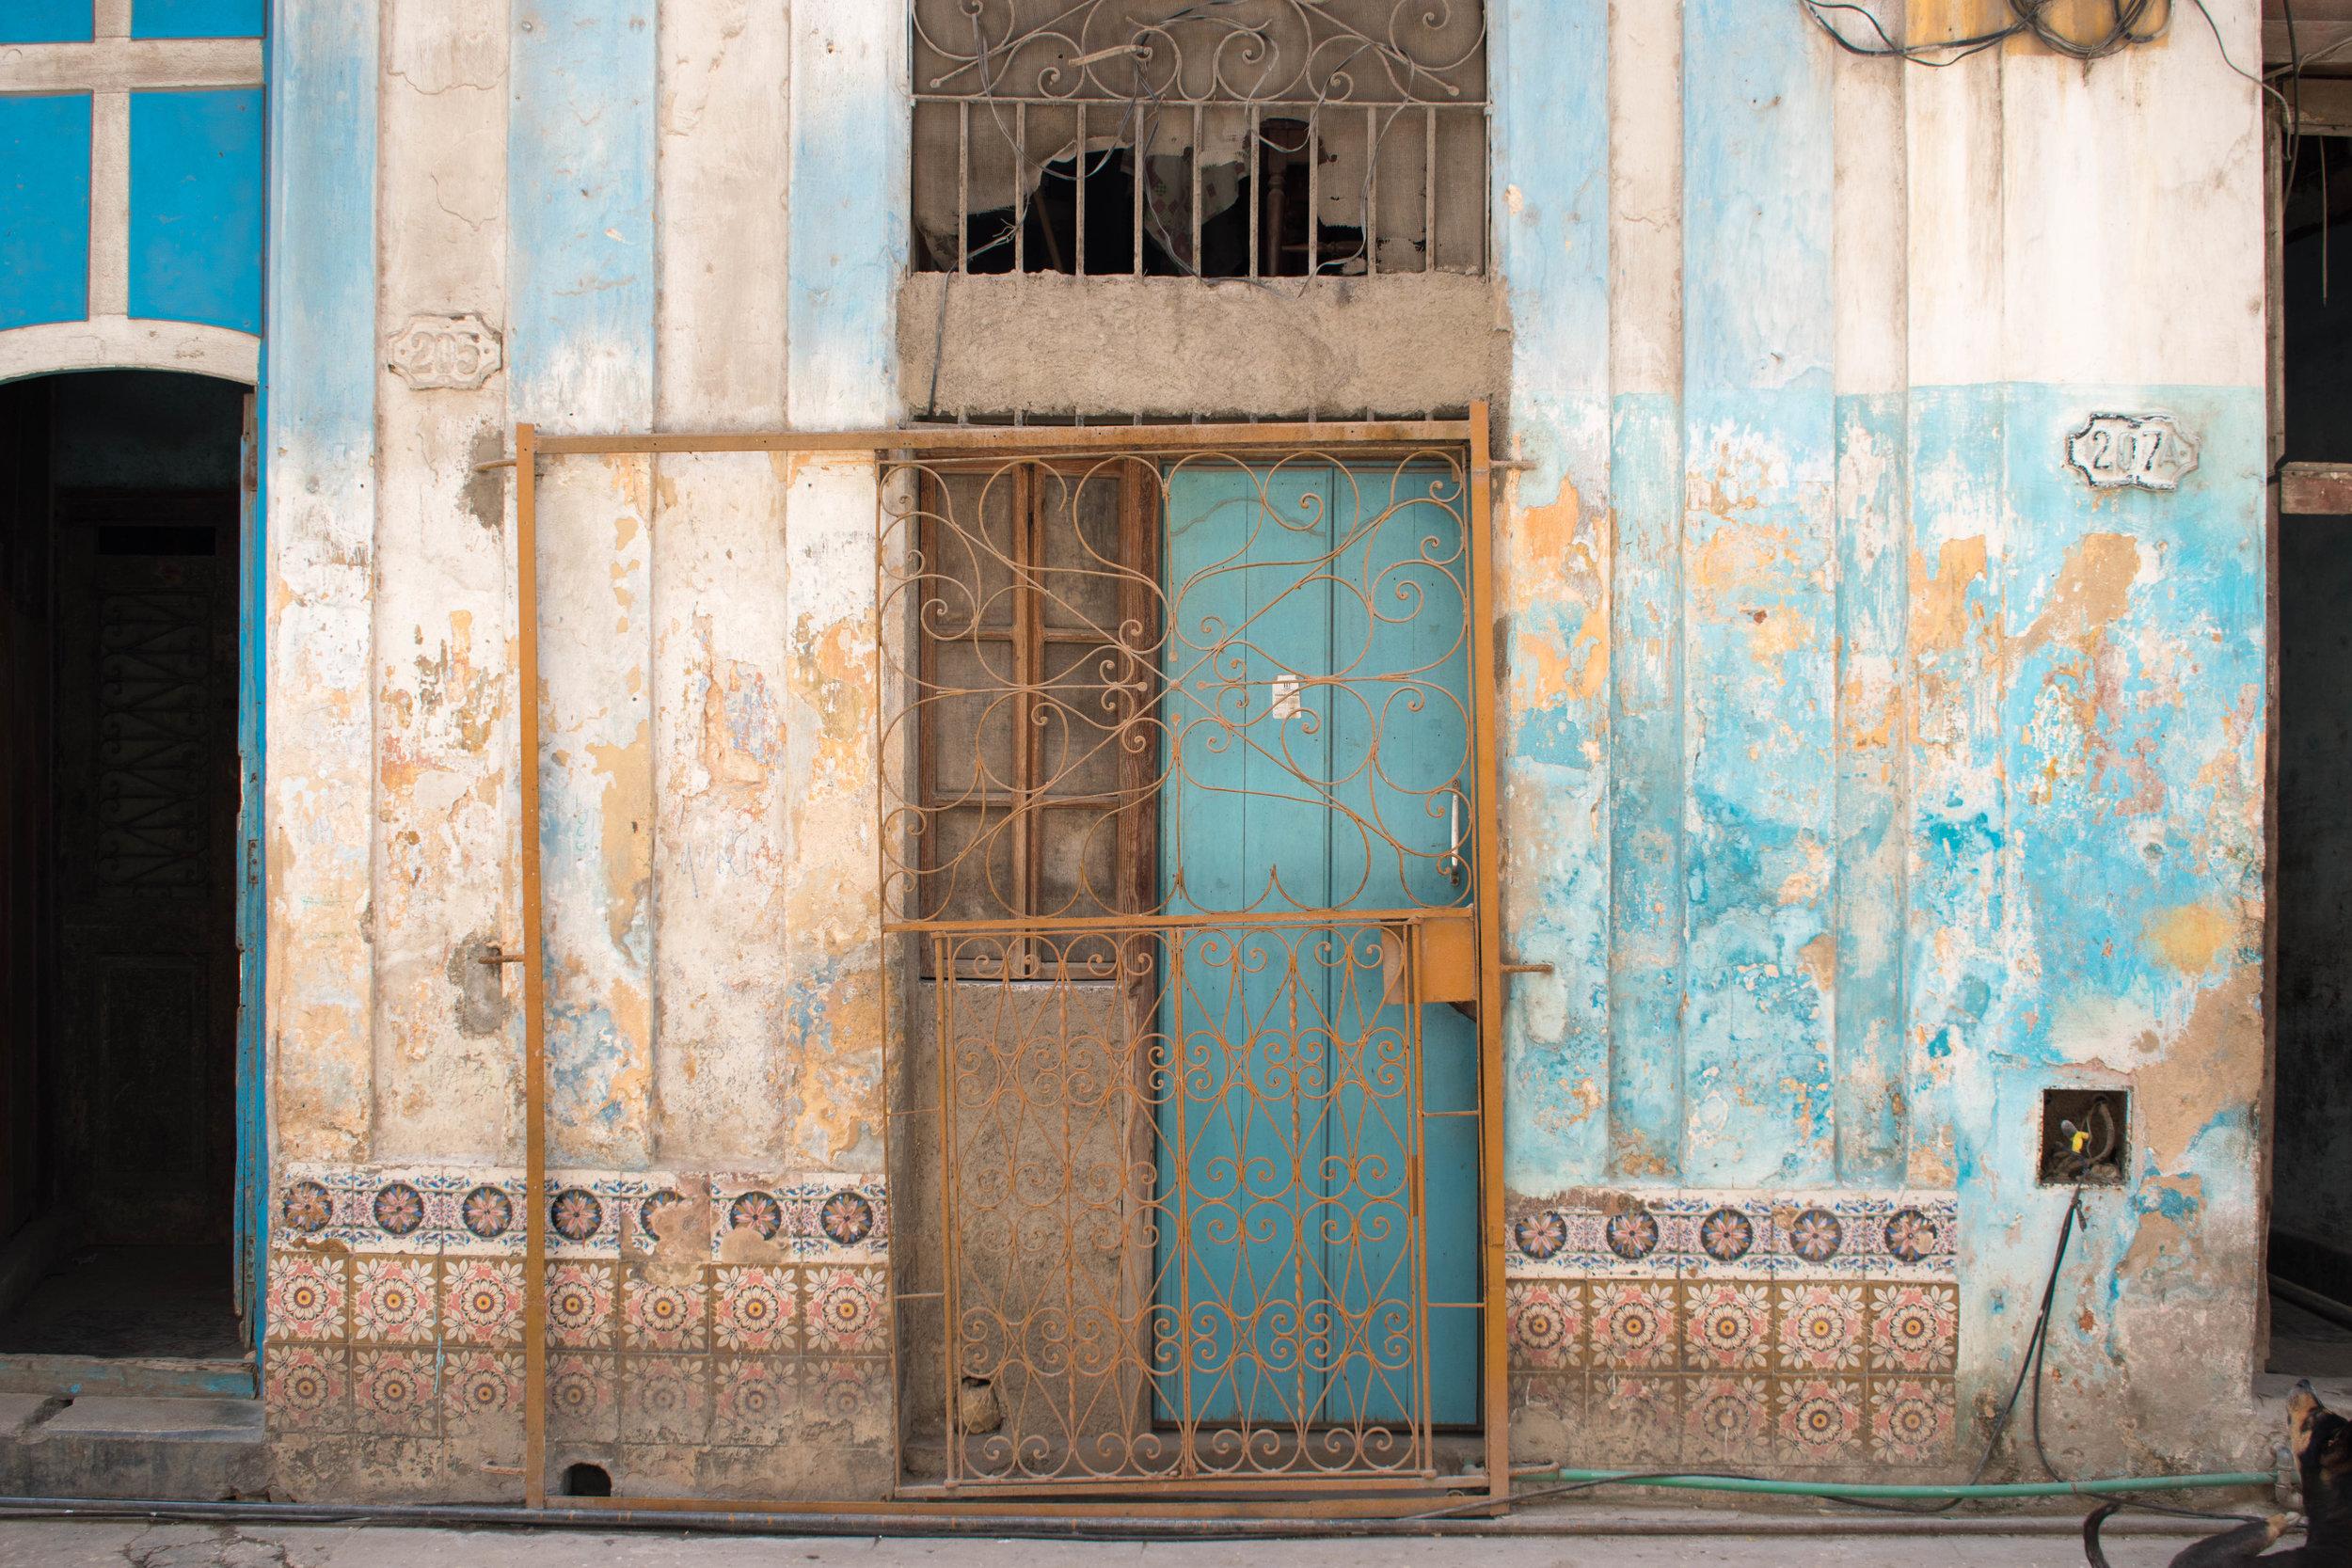 Beautiful Old Building Exteriors in Havana, Cuba